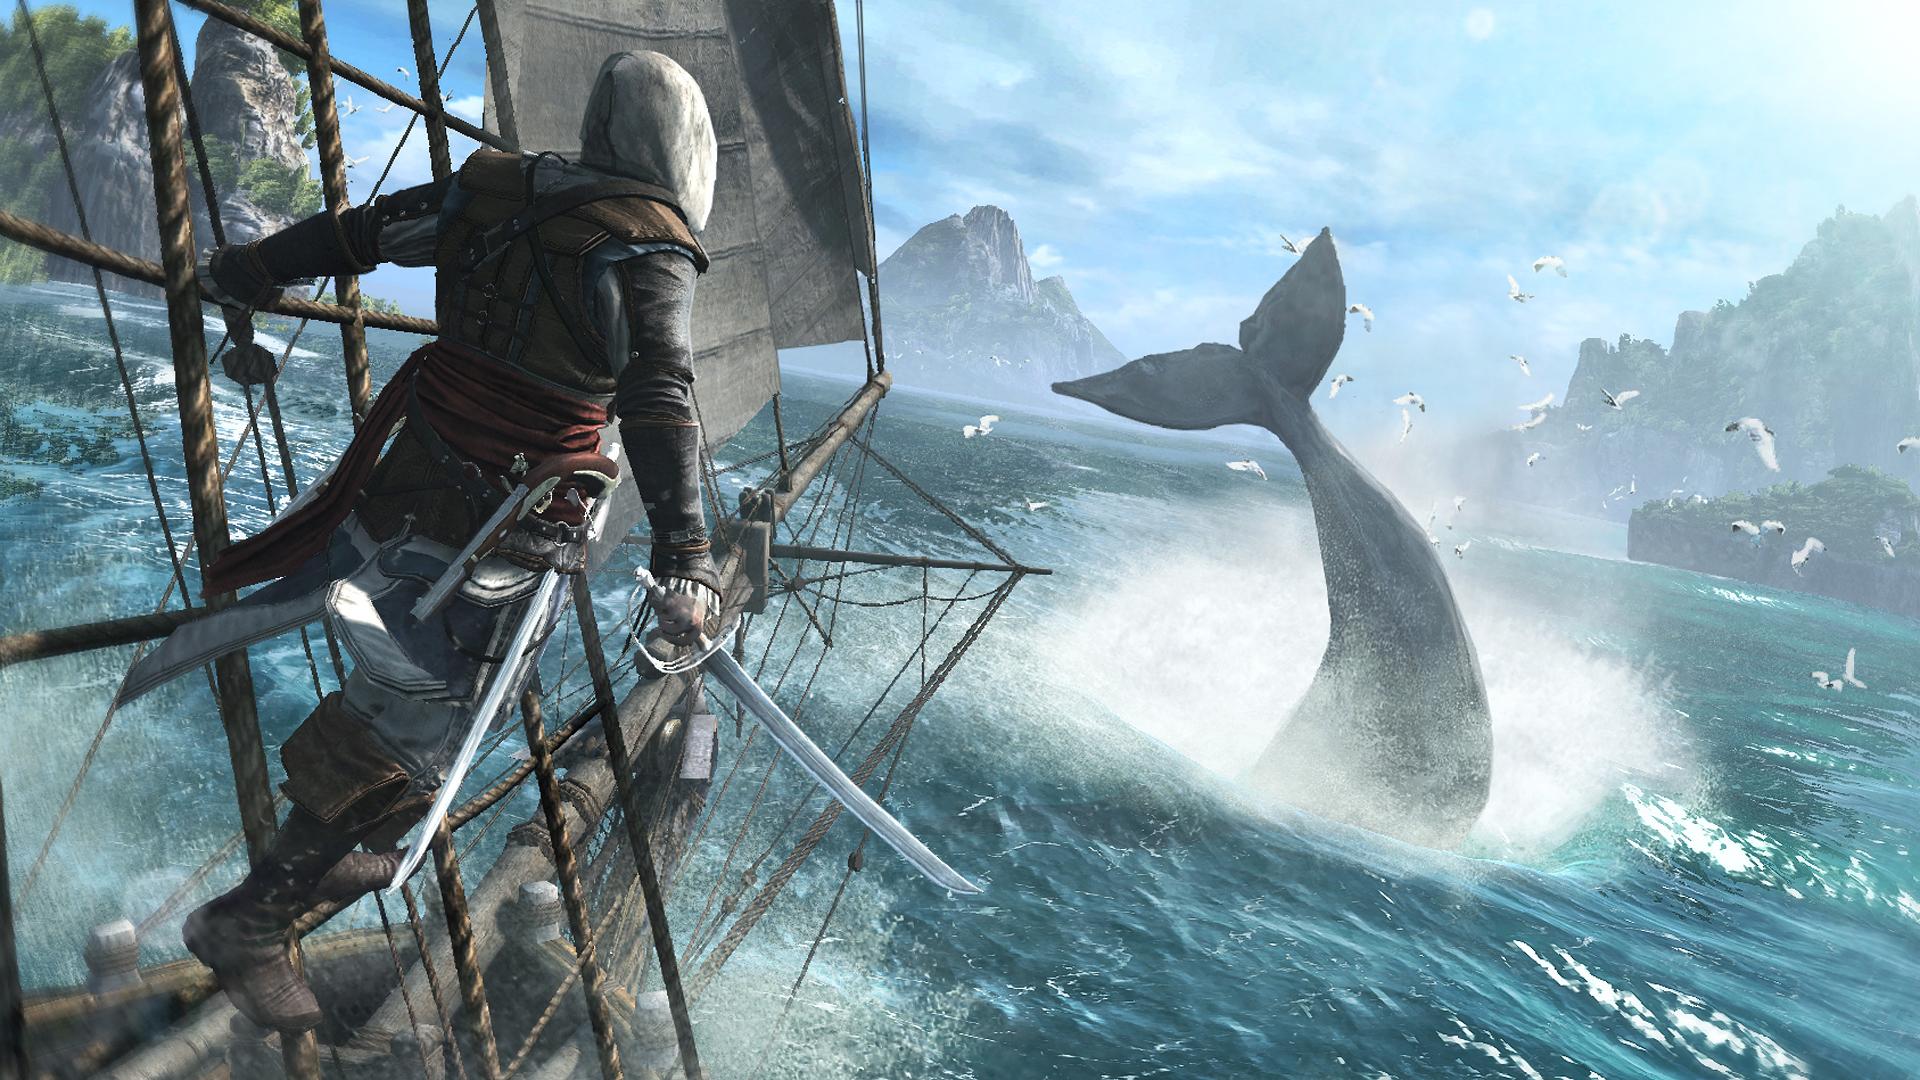 Download Assassins Creed IV Black Flag Jackdaw Edition